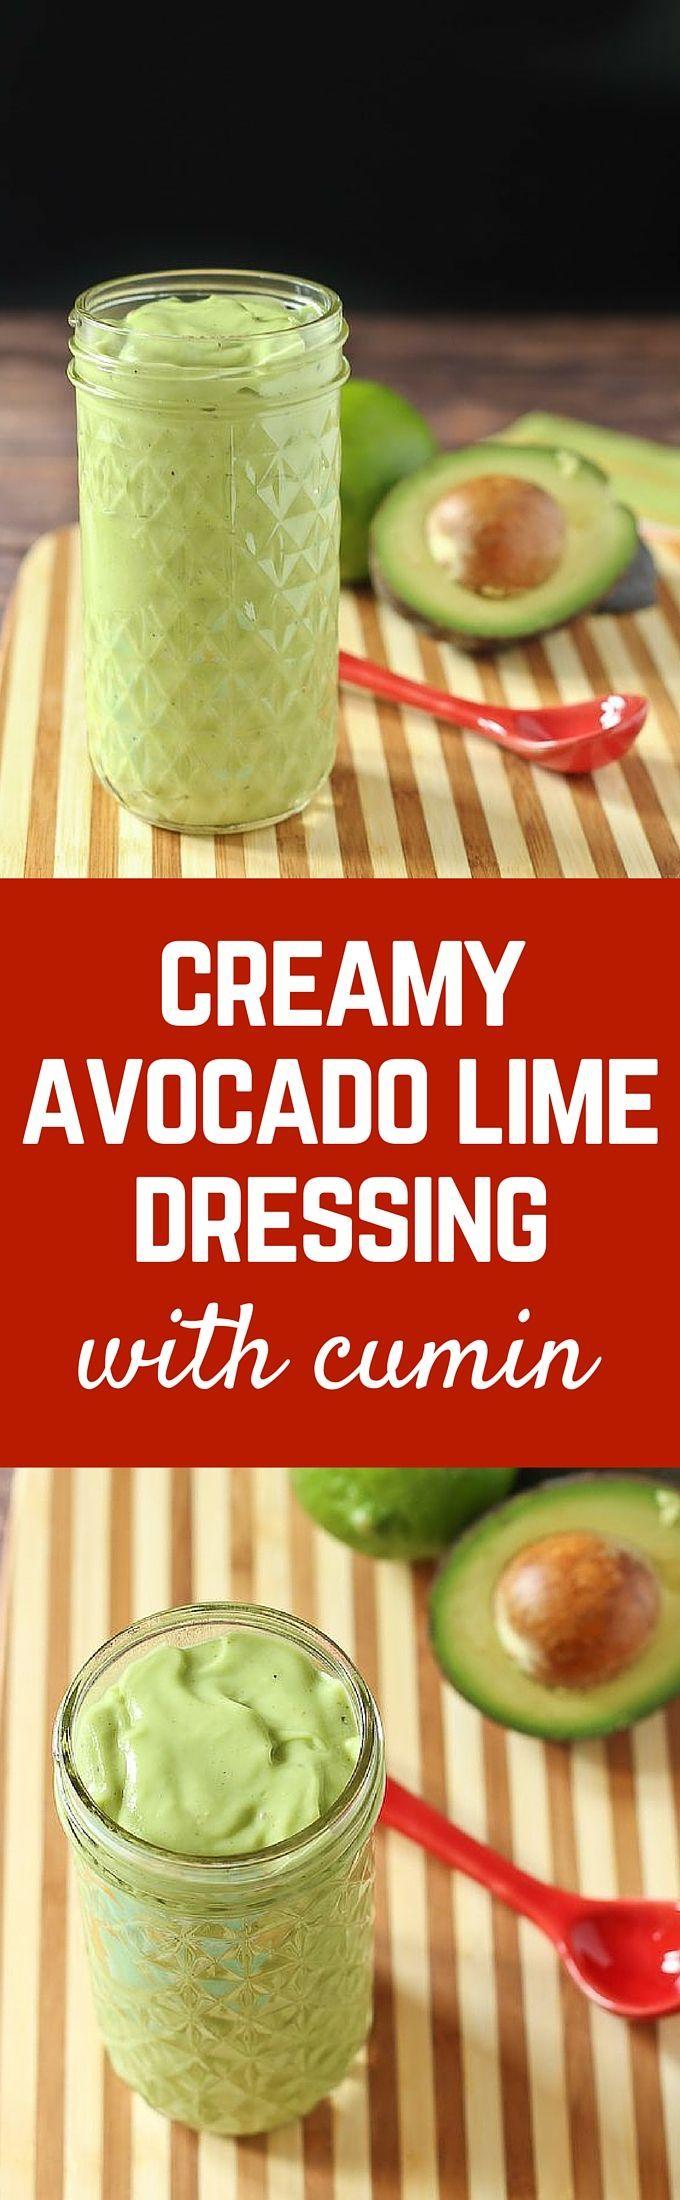 Creamy Avocado Lime Dressing with Cumin